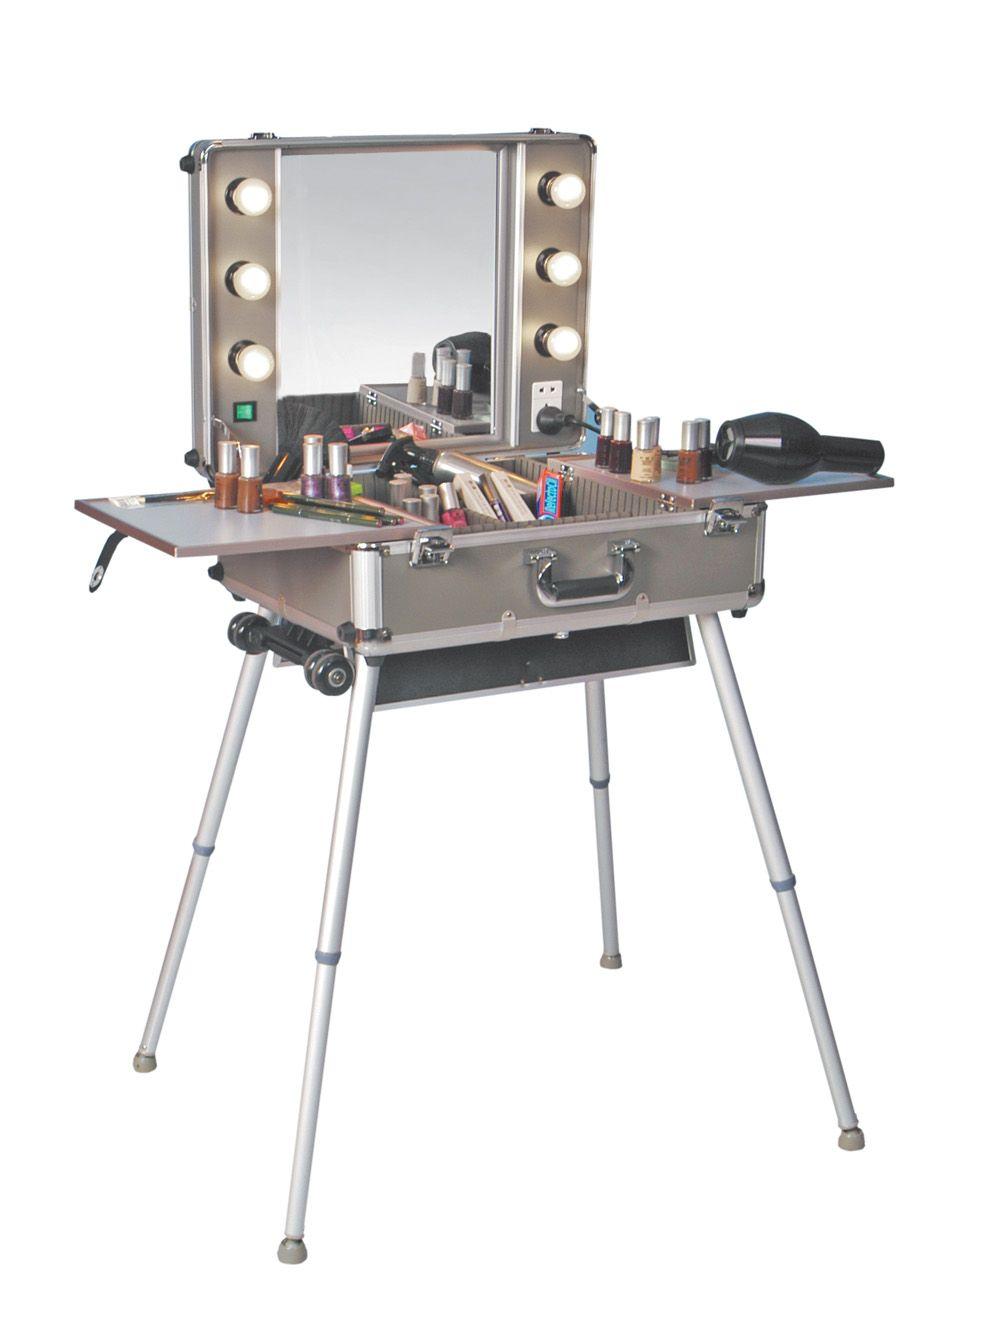 STM Studio Supplies - Portable Makeup Mirrors